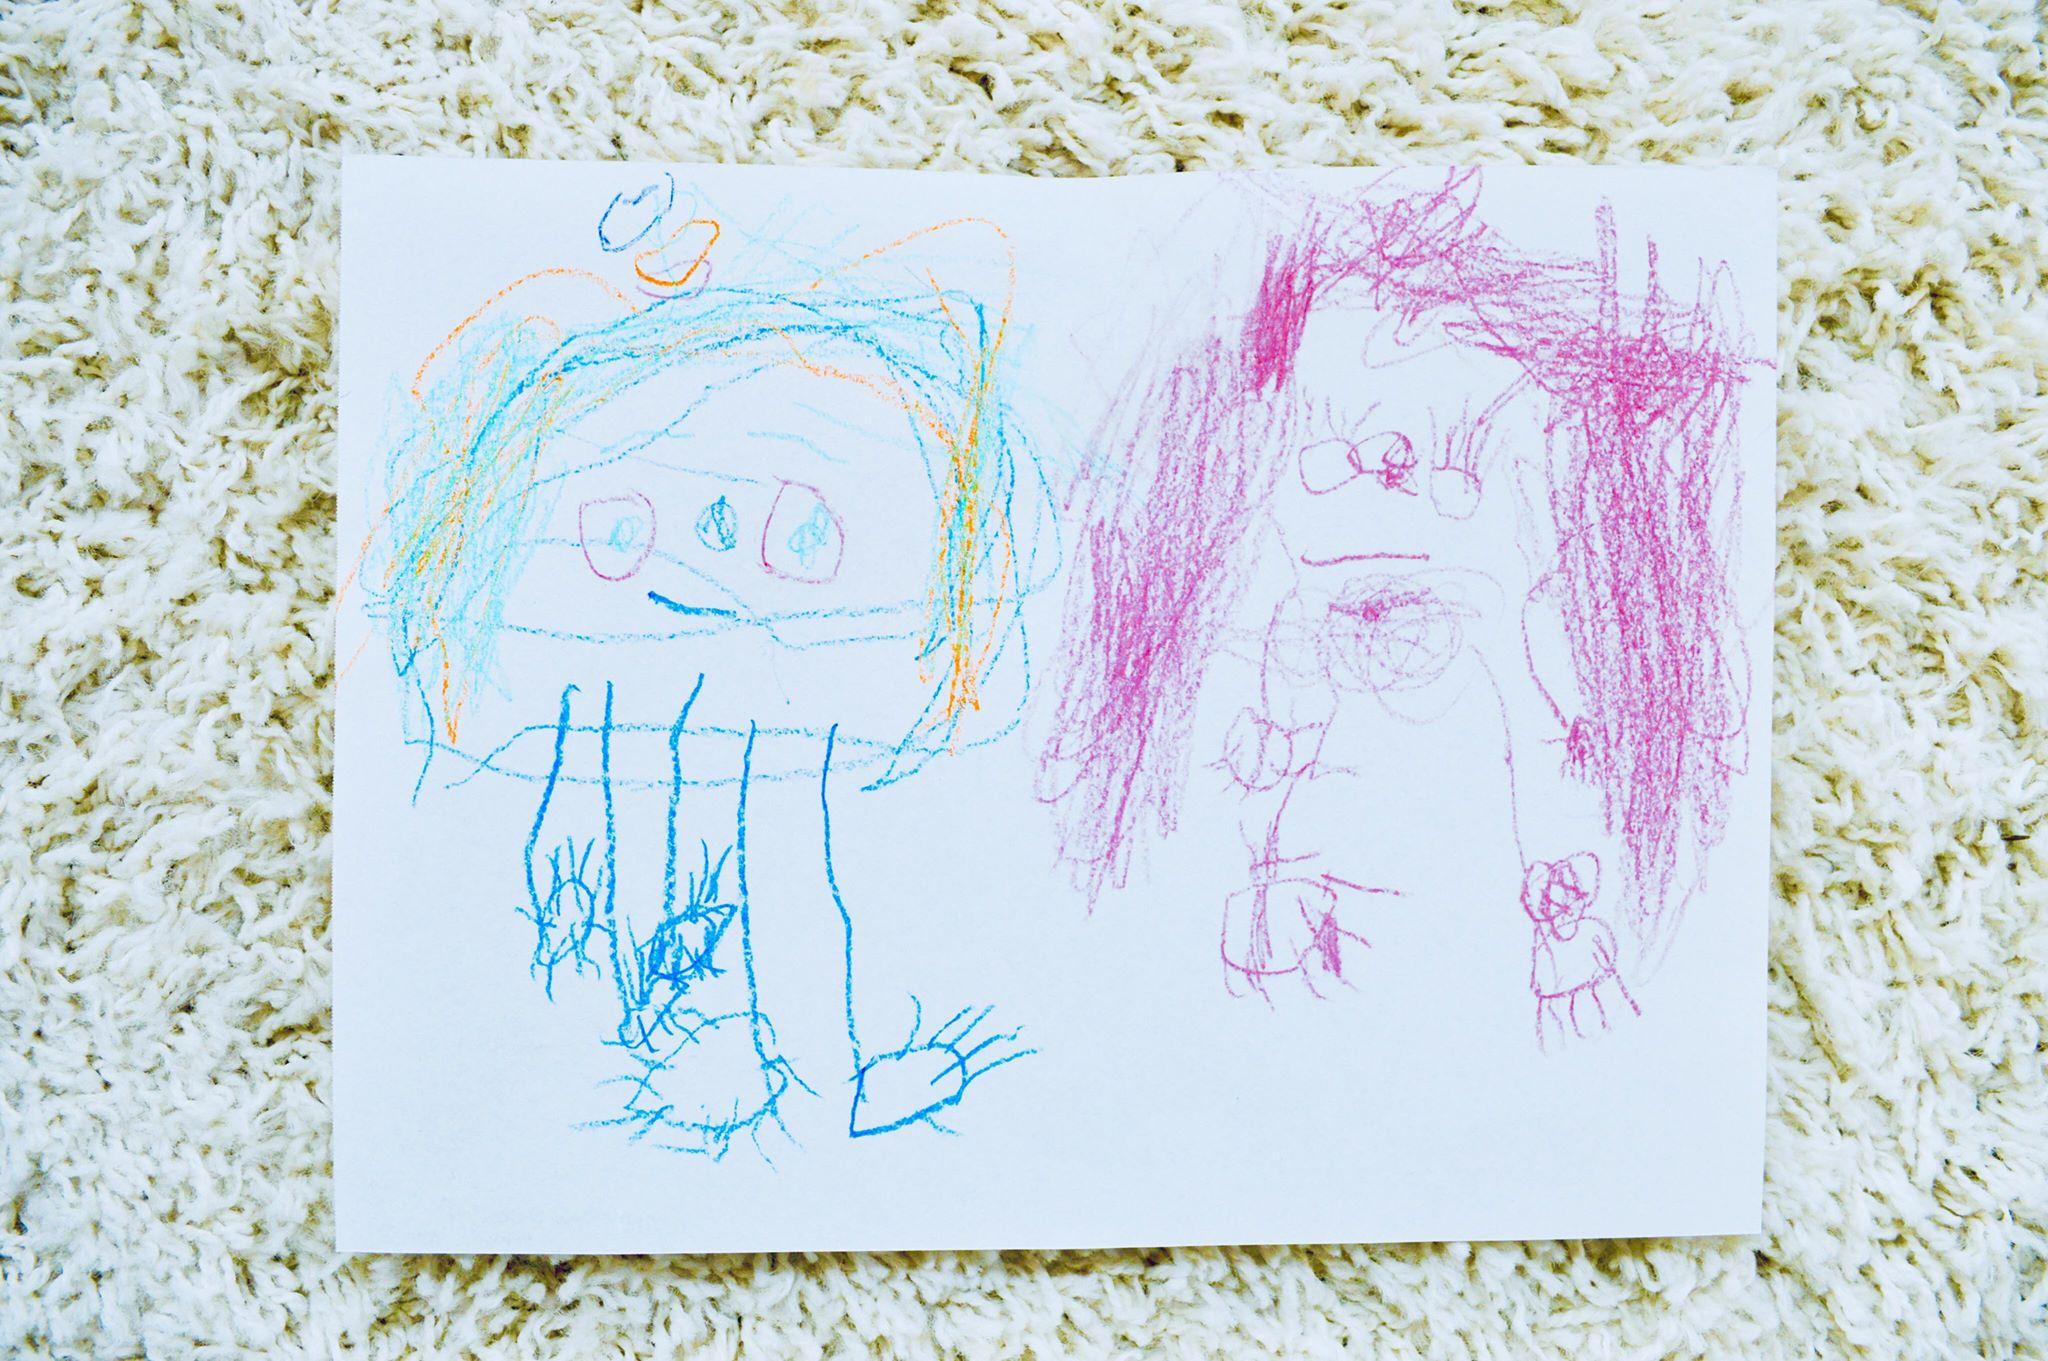 illustration, rainbow, unicorn, unschooling, homeschooling, art, wildschooling, imagination